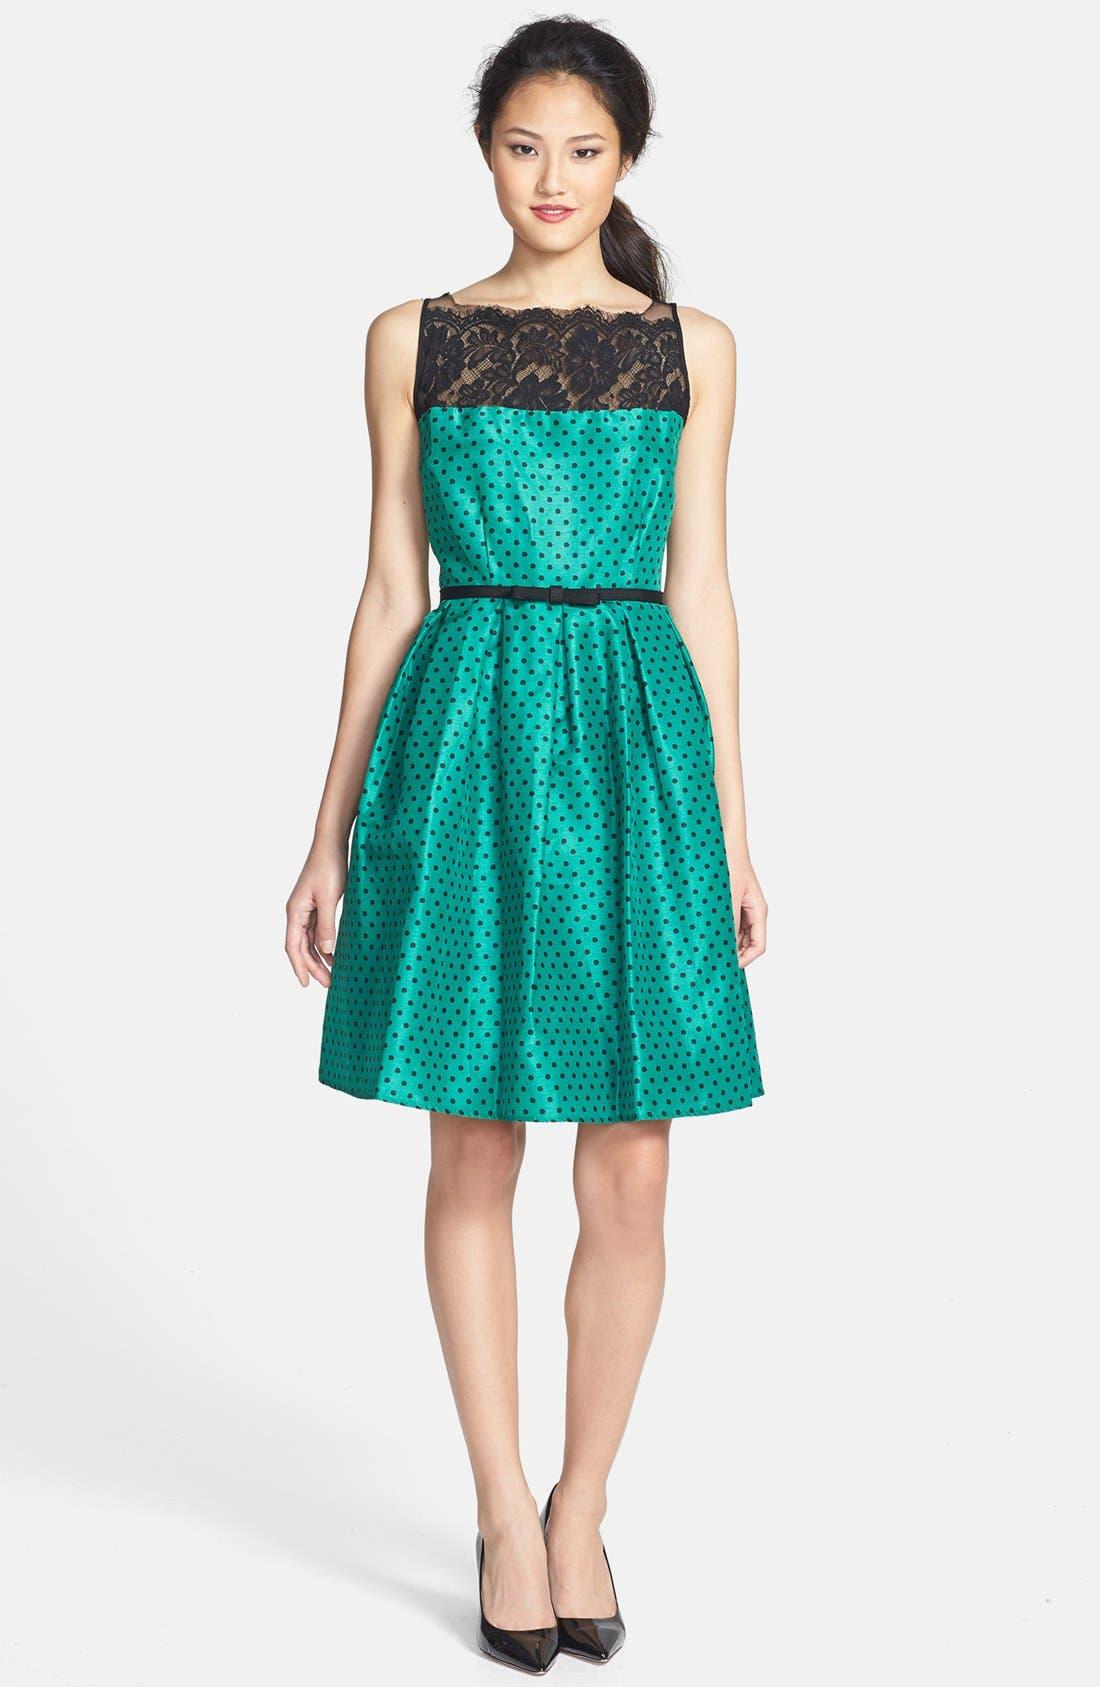 Main Image - Taylor Dresses Polka Dot Taffeta Fit & Flare Dress